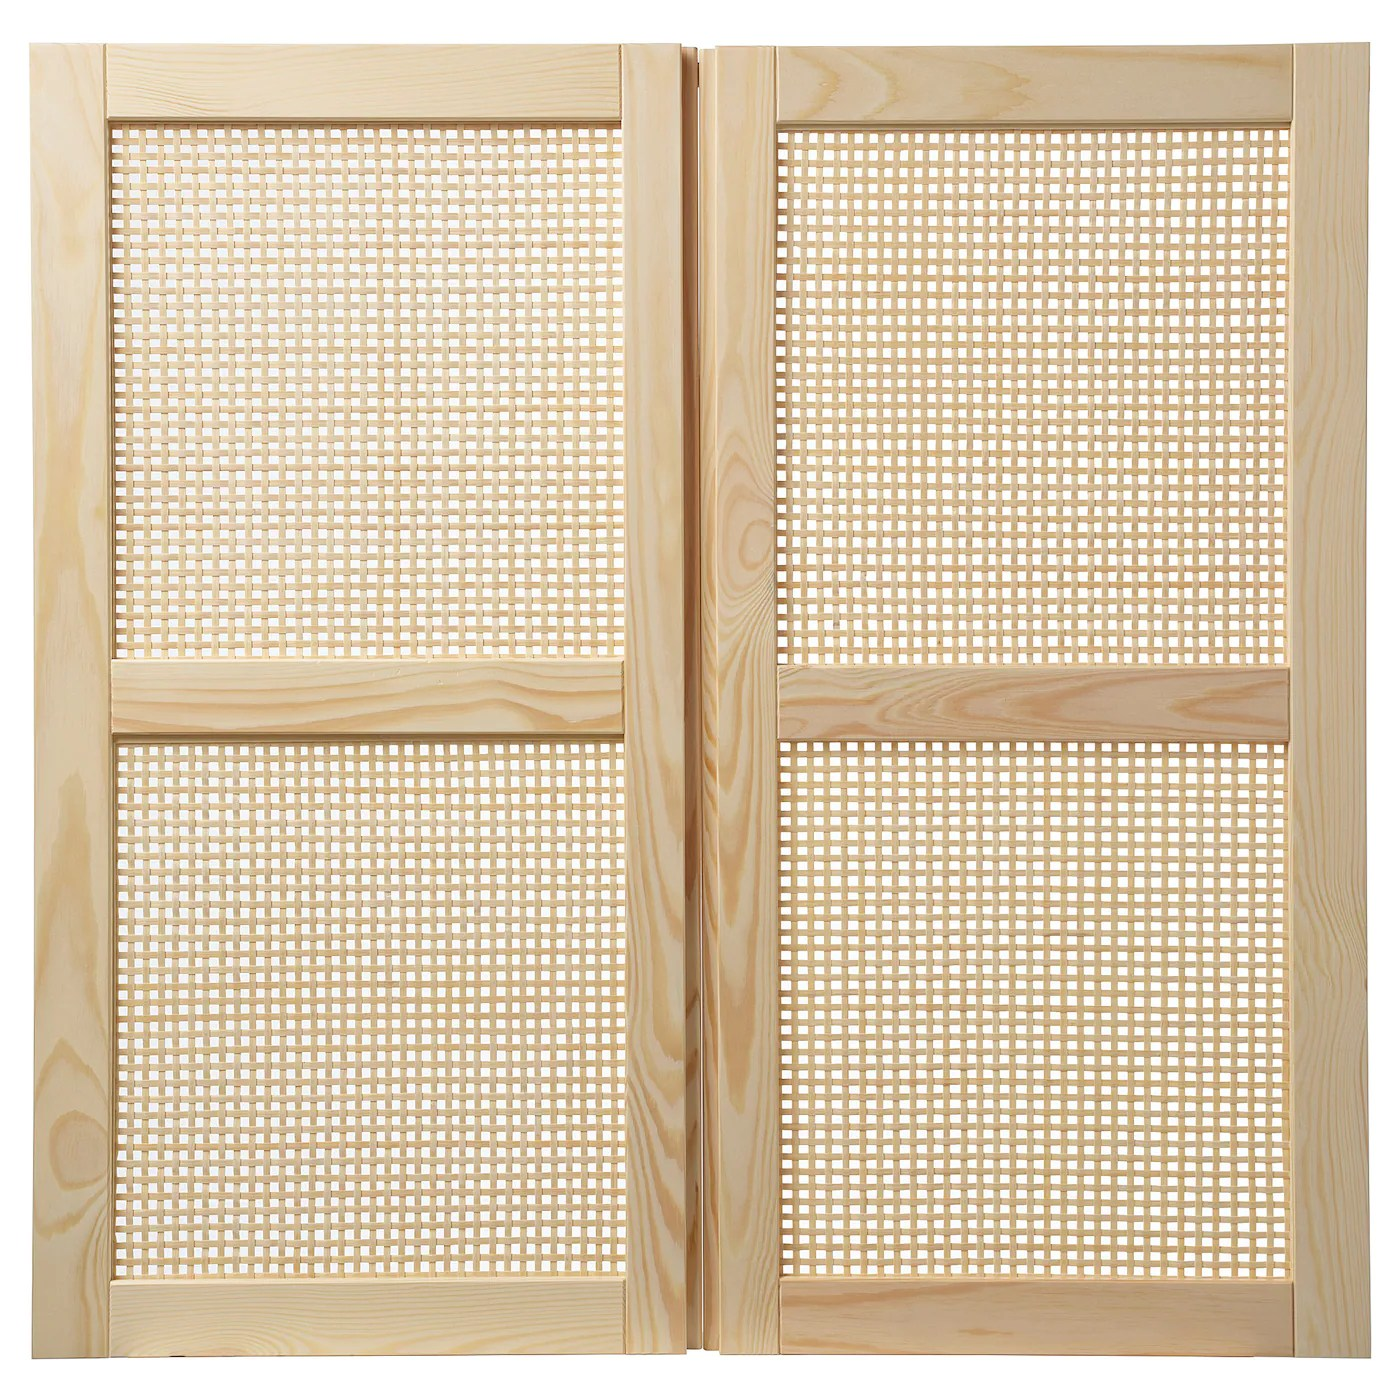 Ivar Porte 42x83 Cm Materiau Durable Ikea